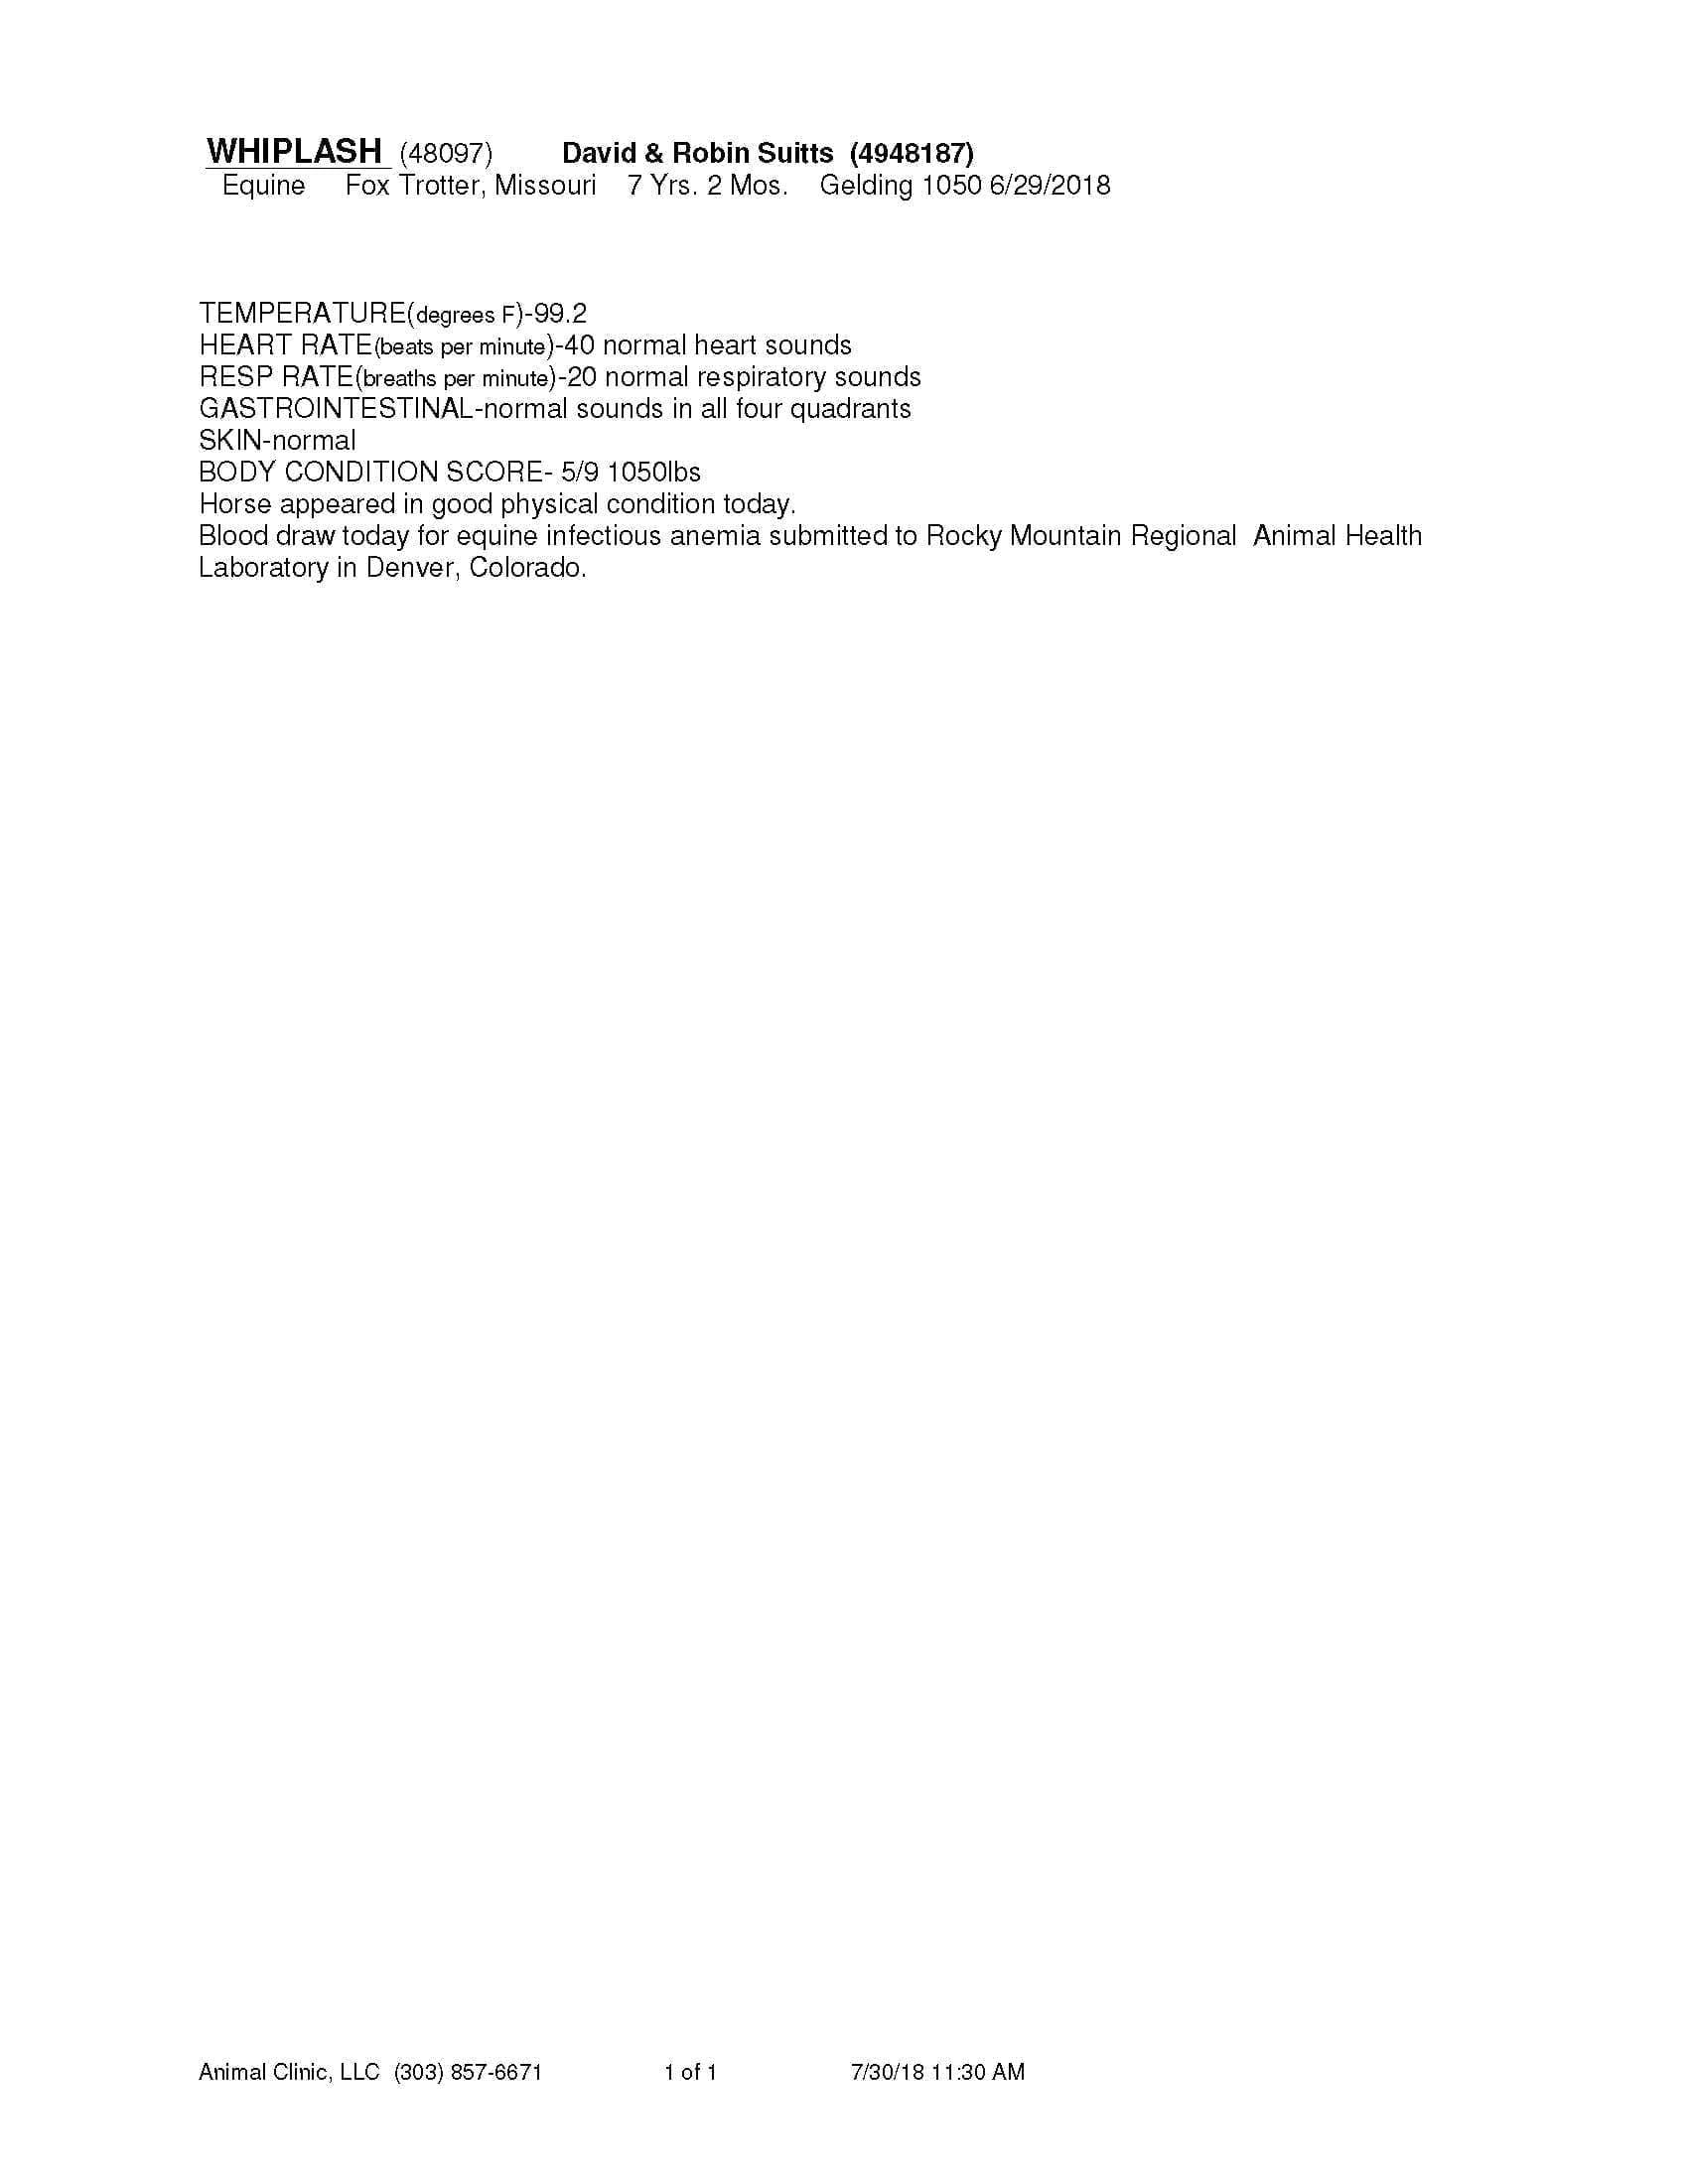 WHIPLASH-48097